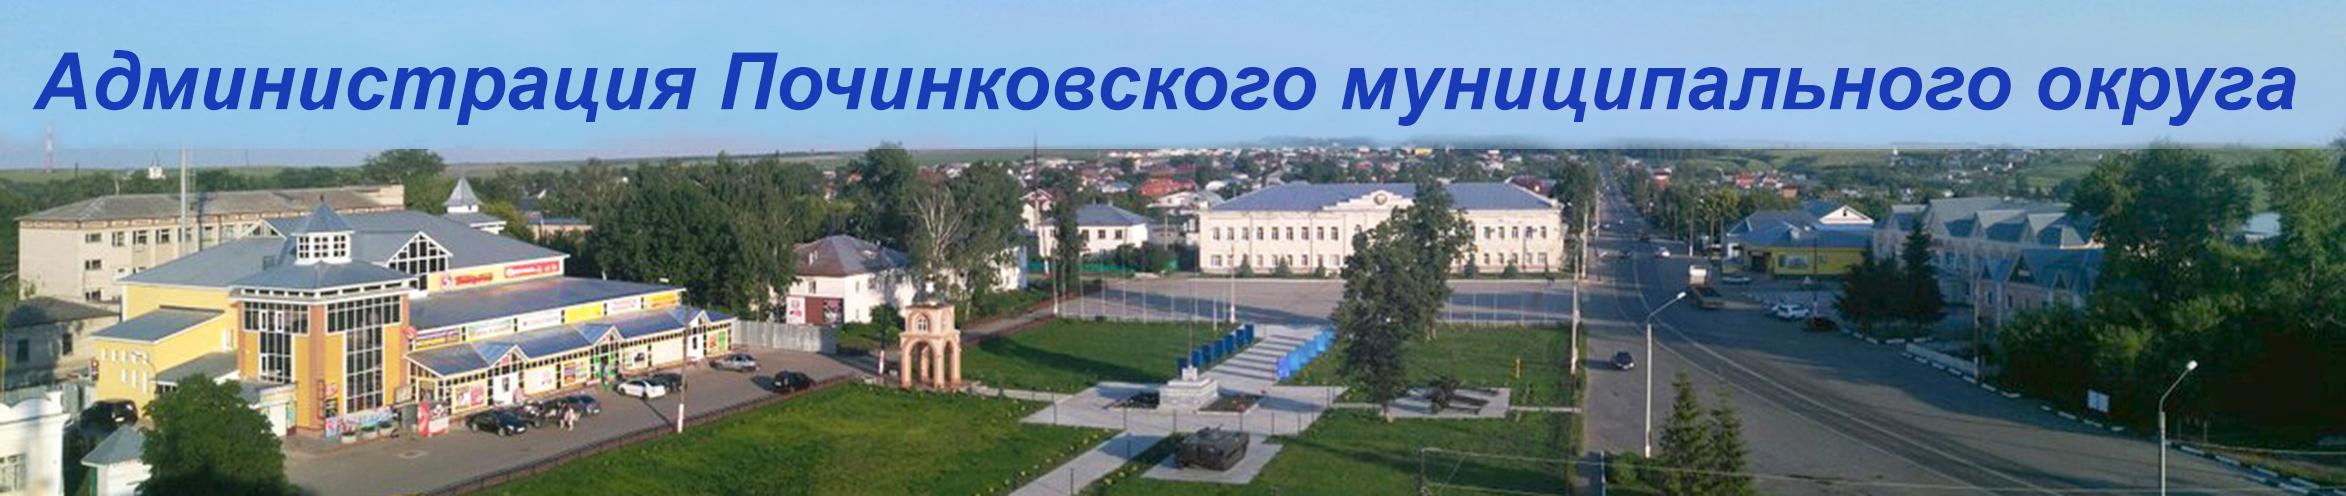 Администрация Починковского района